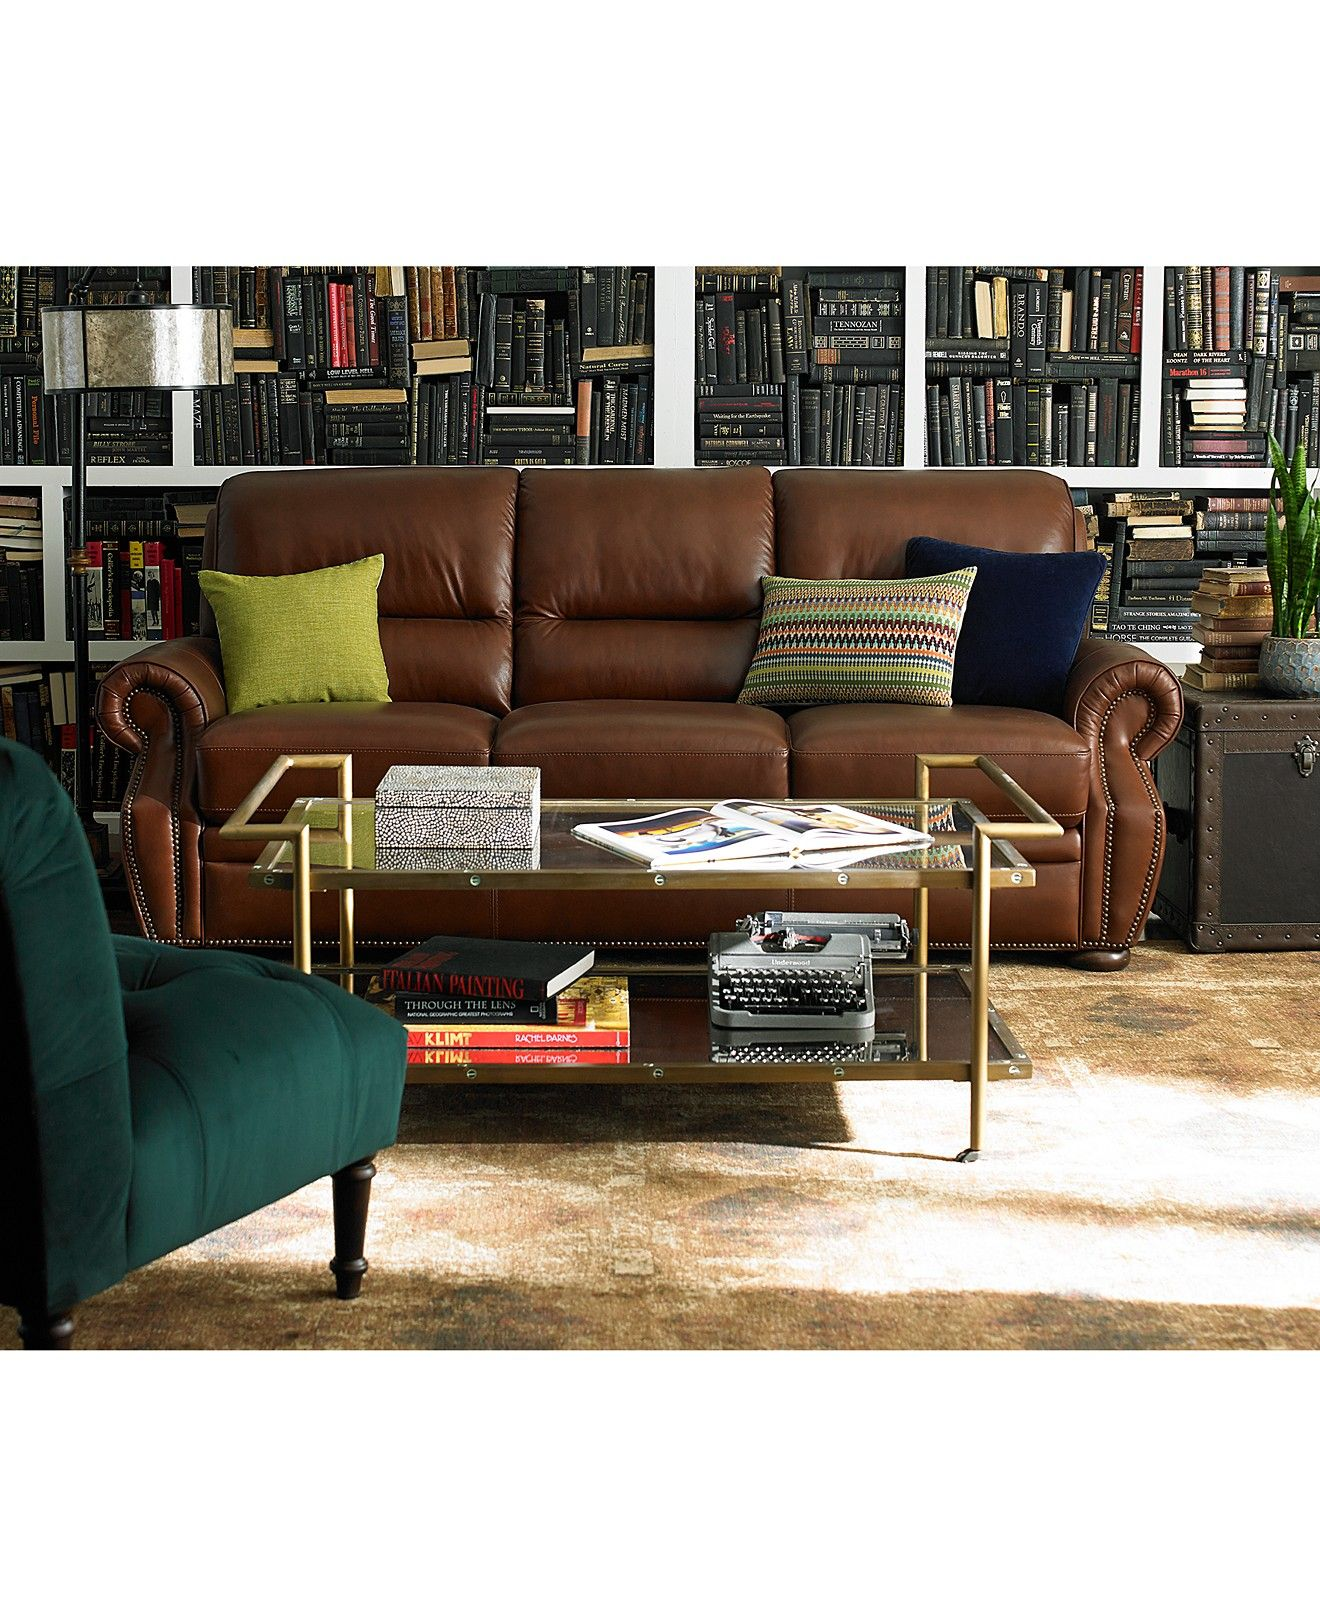 Shop For Living Room Furniture: Royce Leather Sofa Living Room Furniture